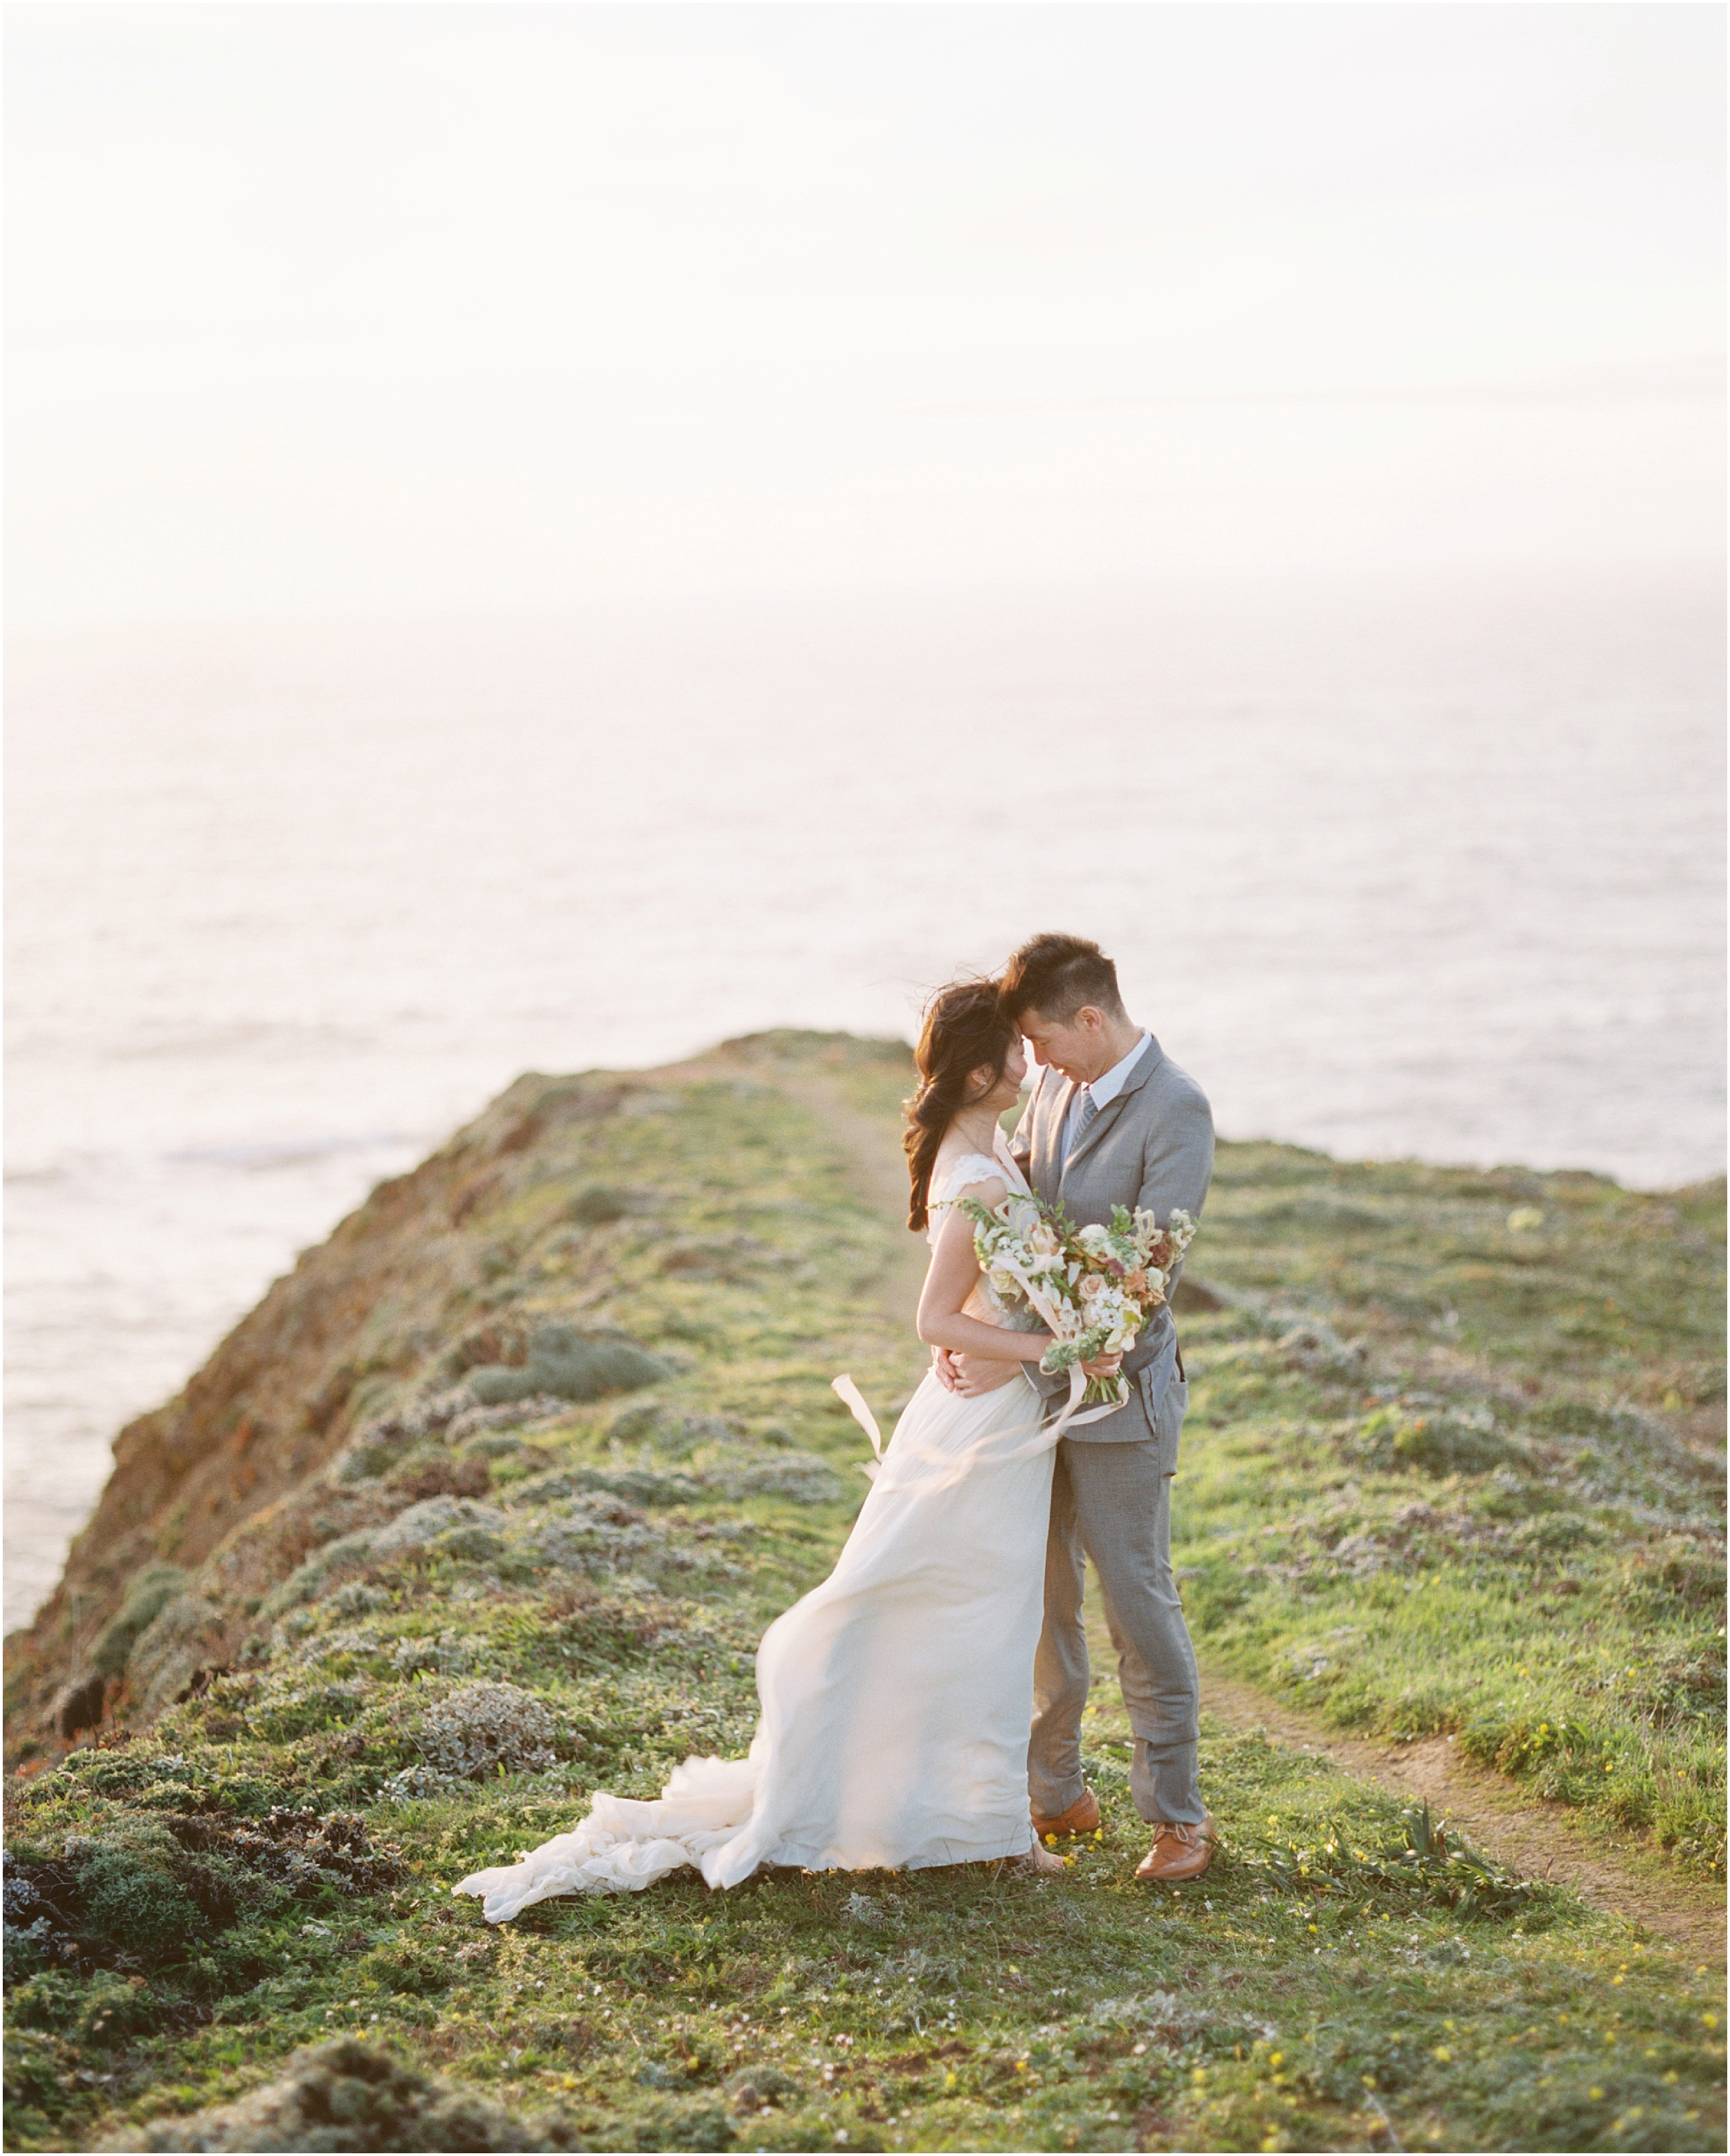 JeremiahRachelPhotography_GreenwoodEvents_CuffeysCove_ElopementWedding_Elk_California0042.JPG